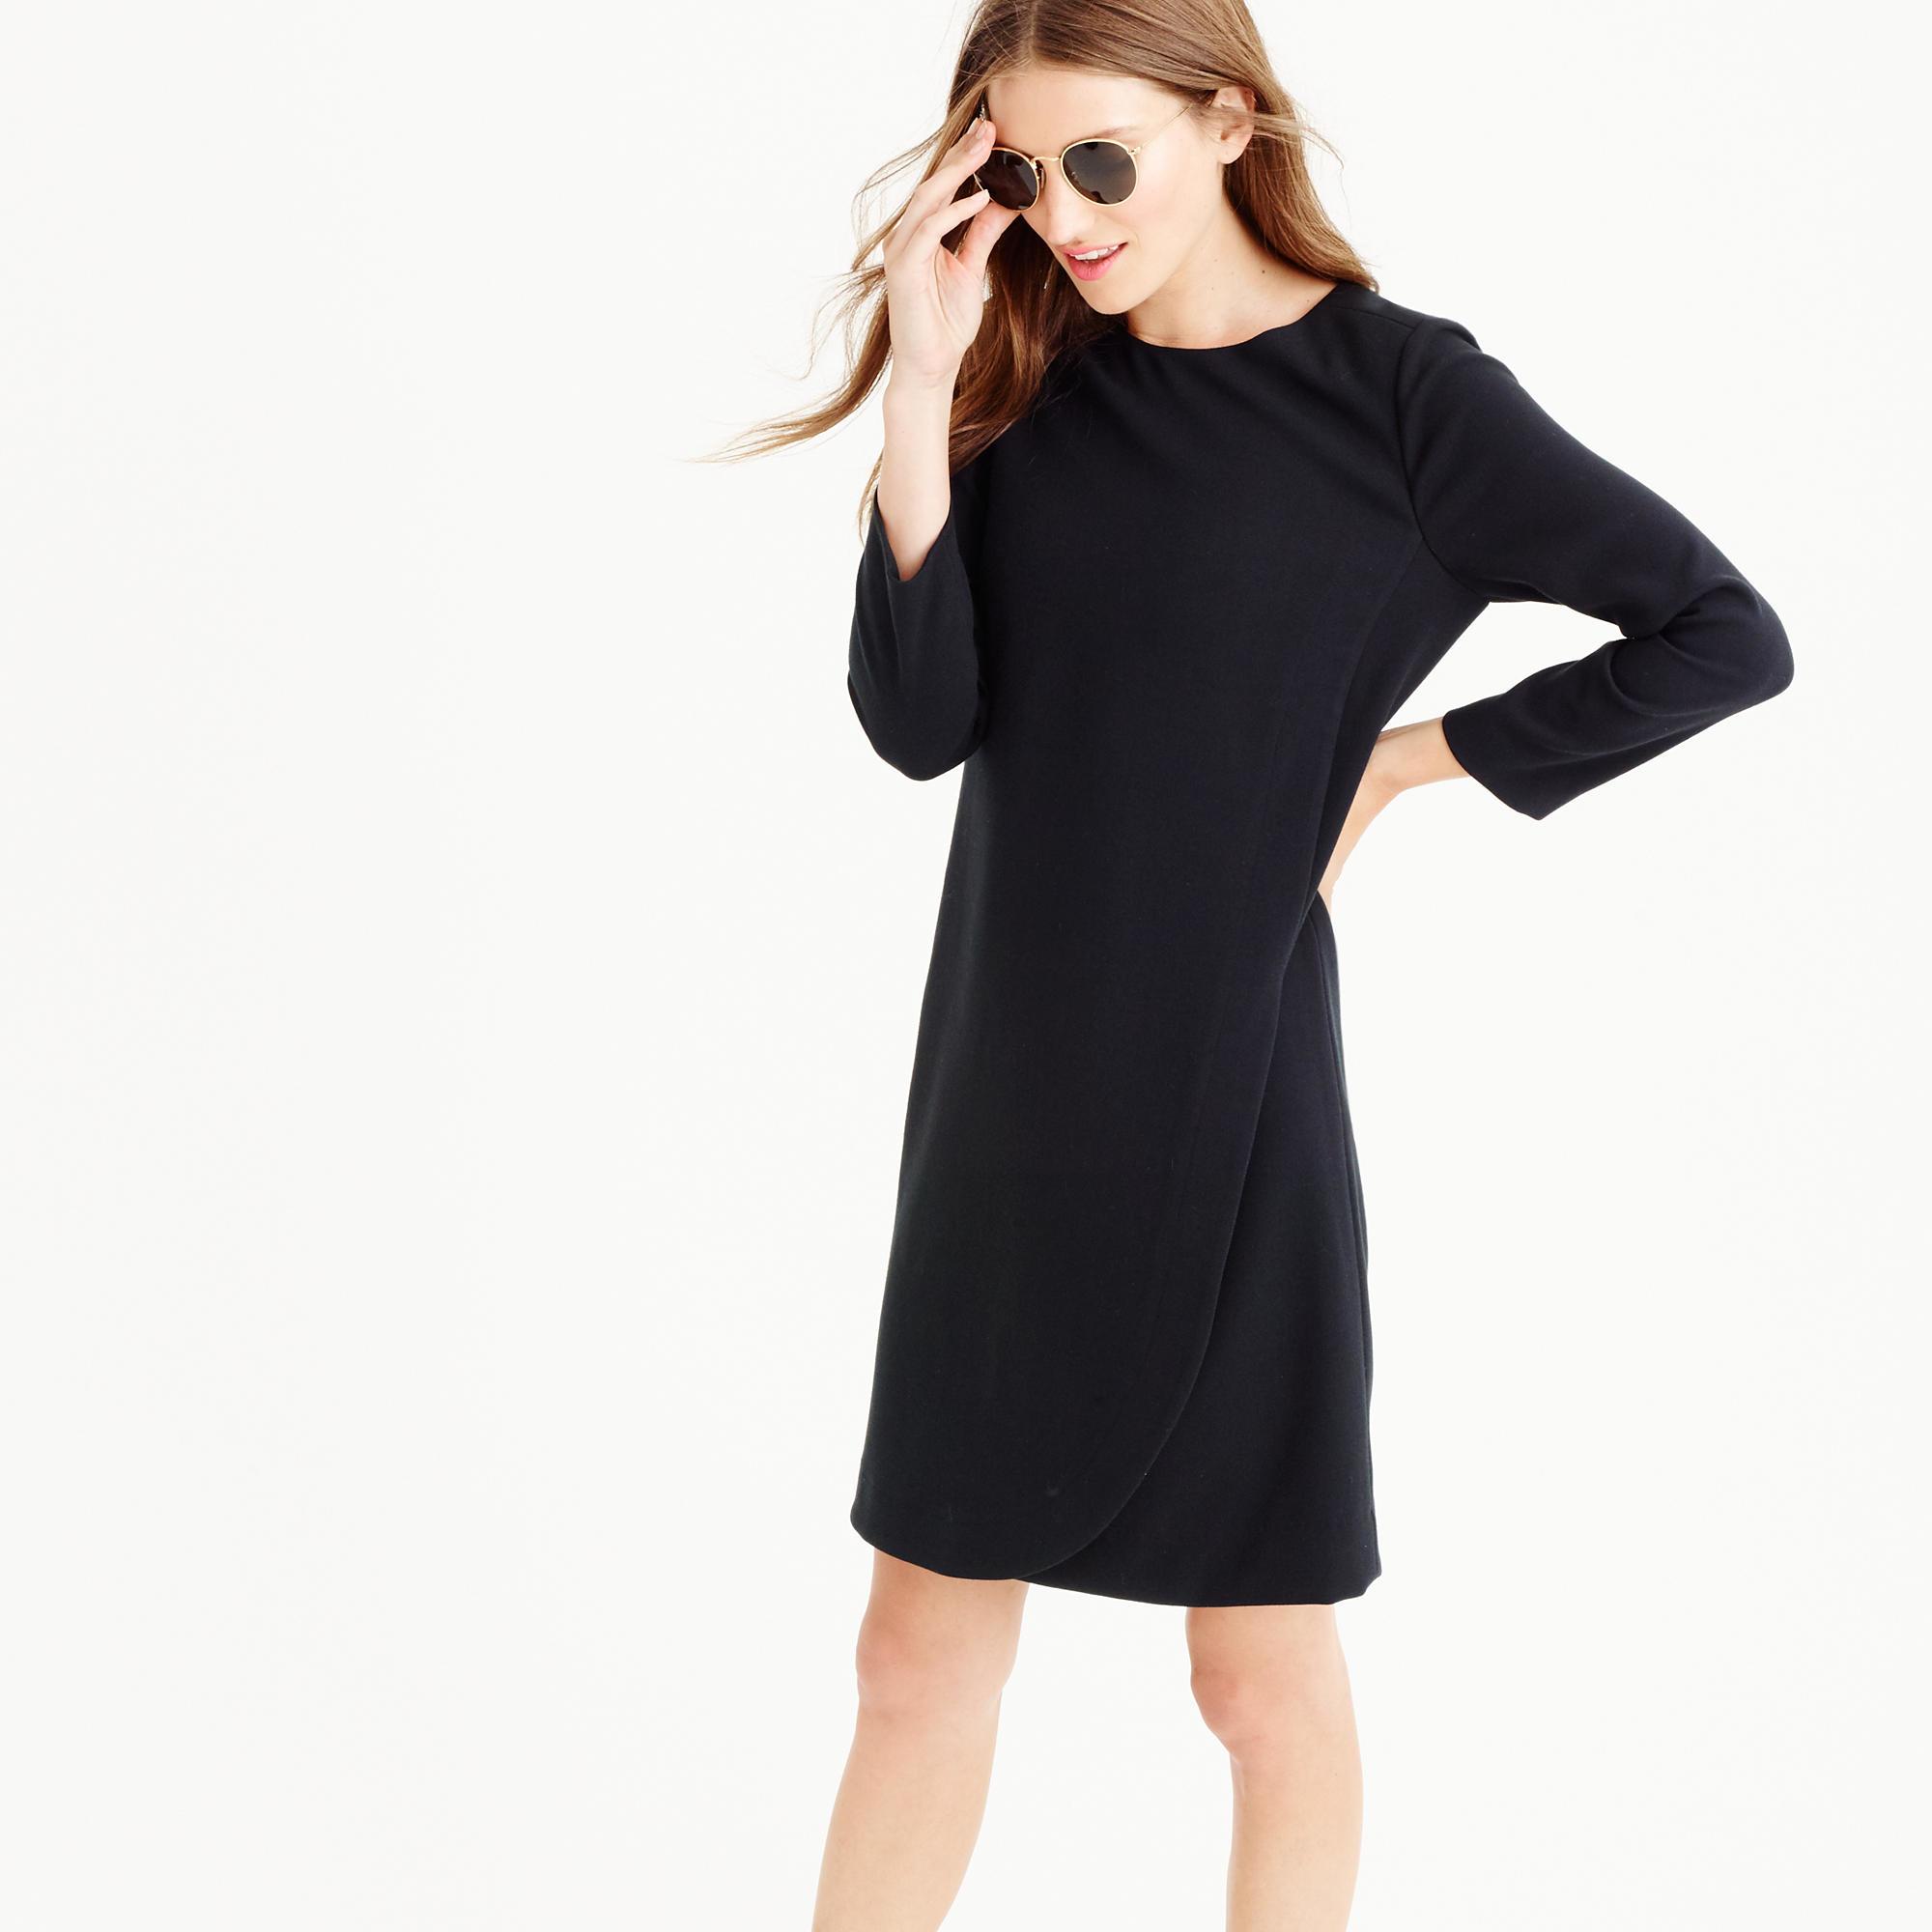 Work Dresses, Bardot, Bodycon, Cami, Little Black Dress, Shift, Shirt Dress Sunday Delivery· Sizes · Free Returns.